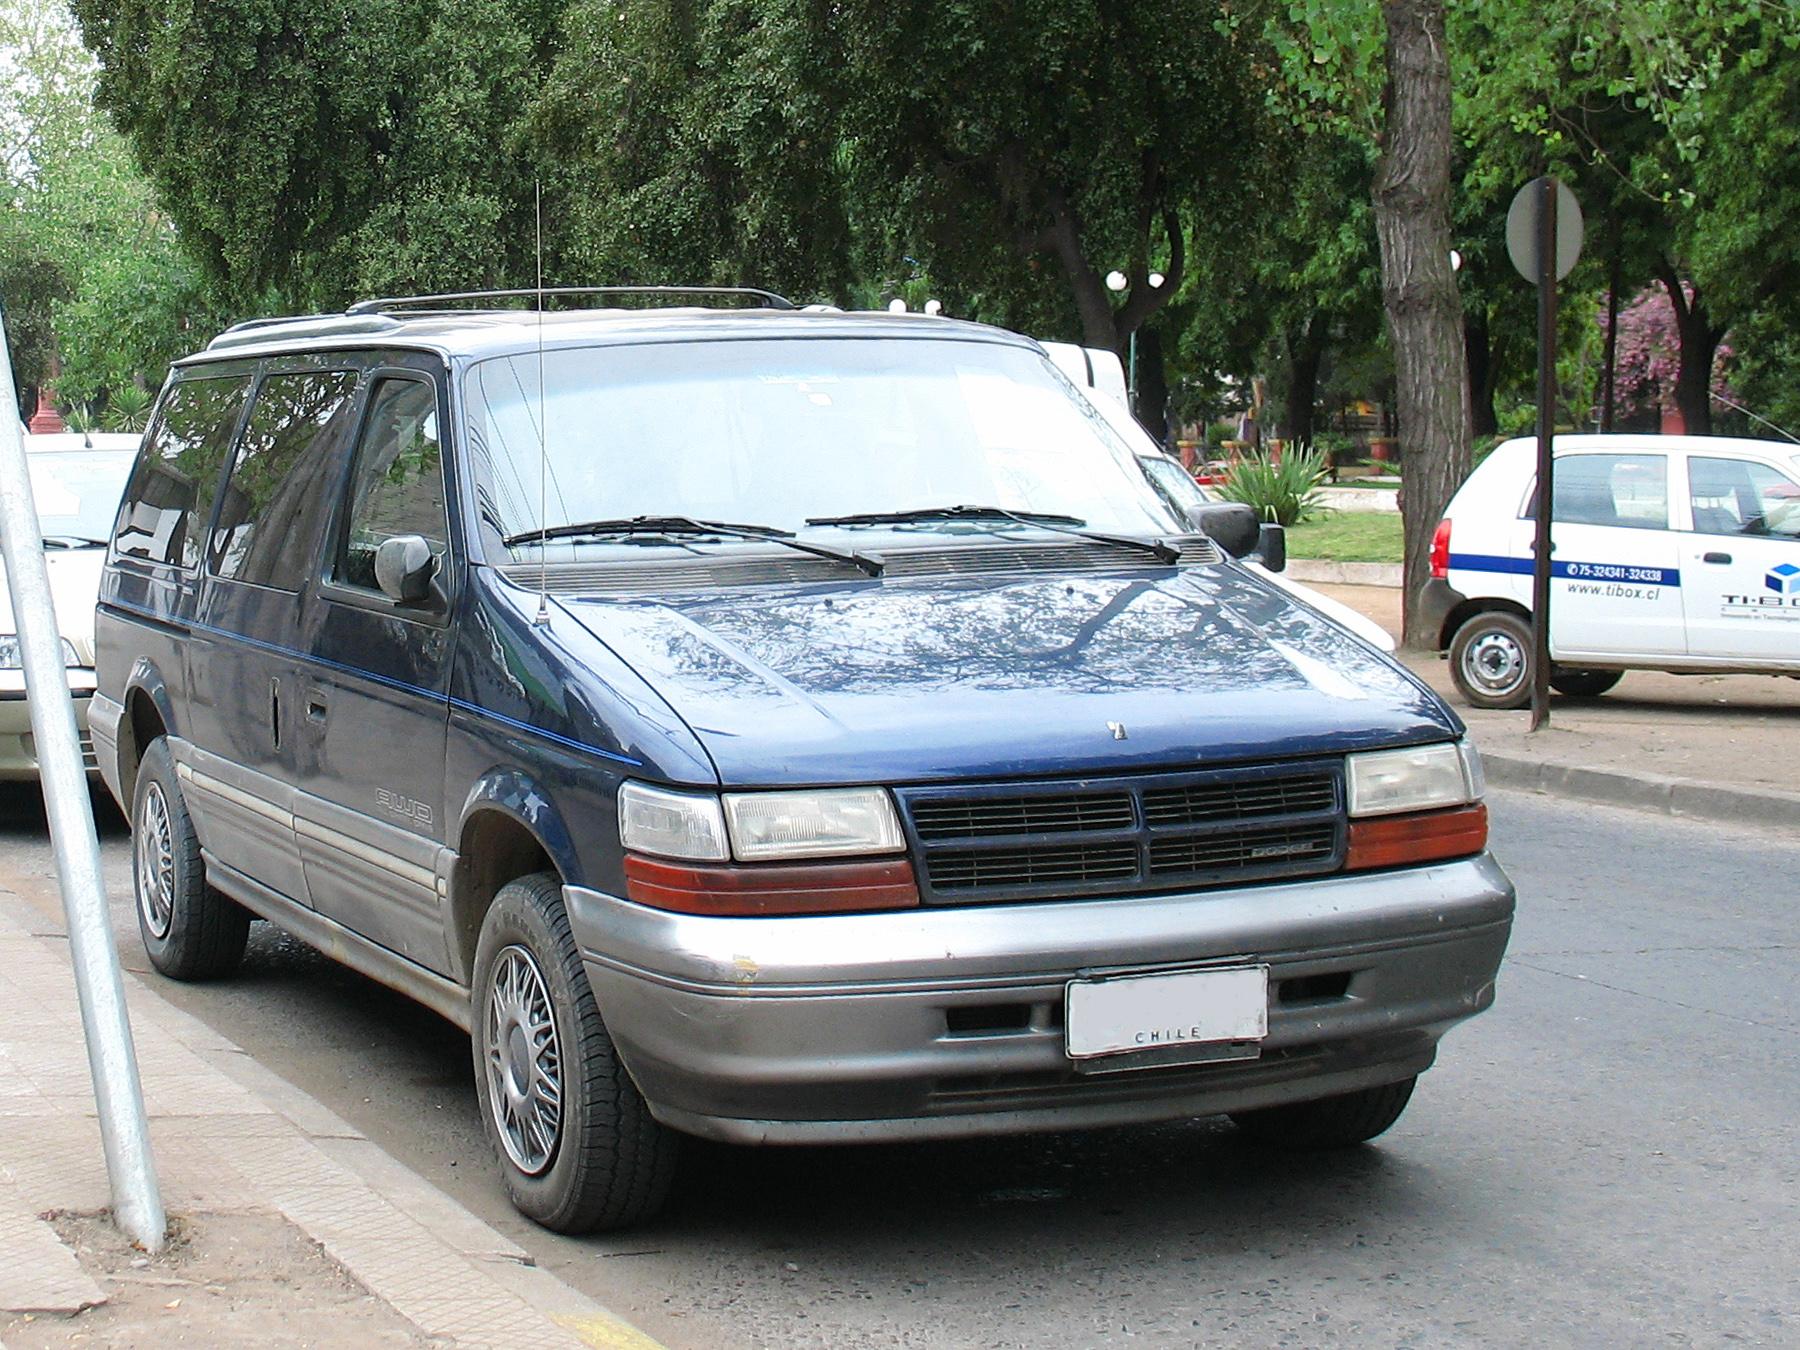 dodge grand caravan awd ملف:Dodge Grand Caravan SE 2.2 AWD 2 (22996659216).jpg - ويكيبيديا